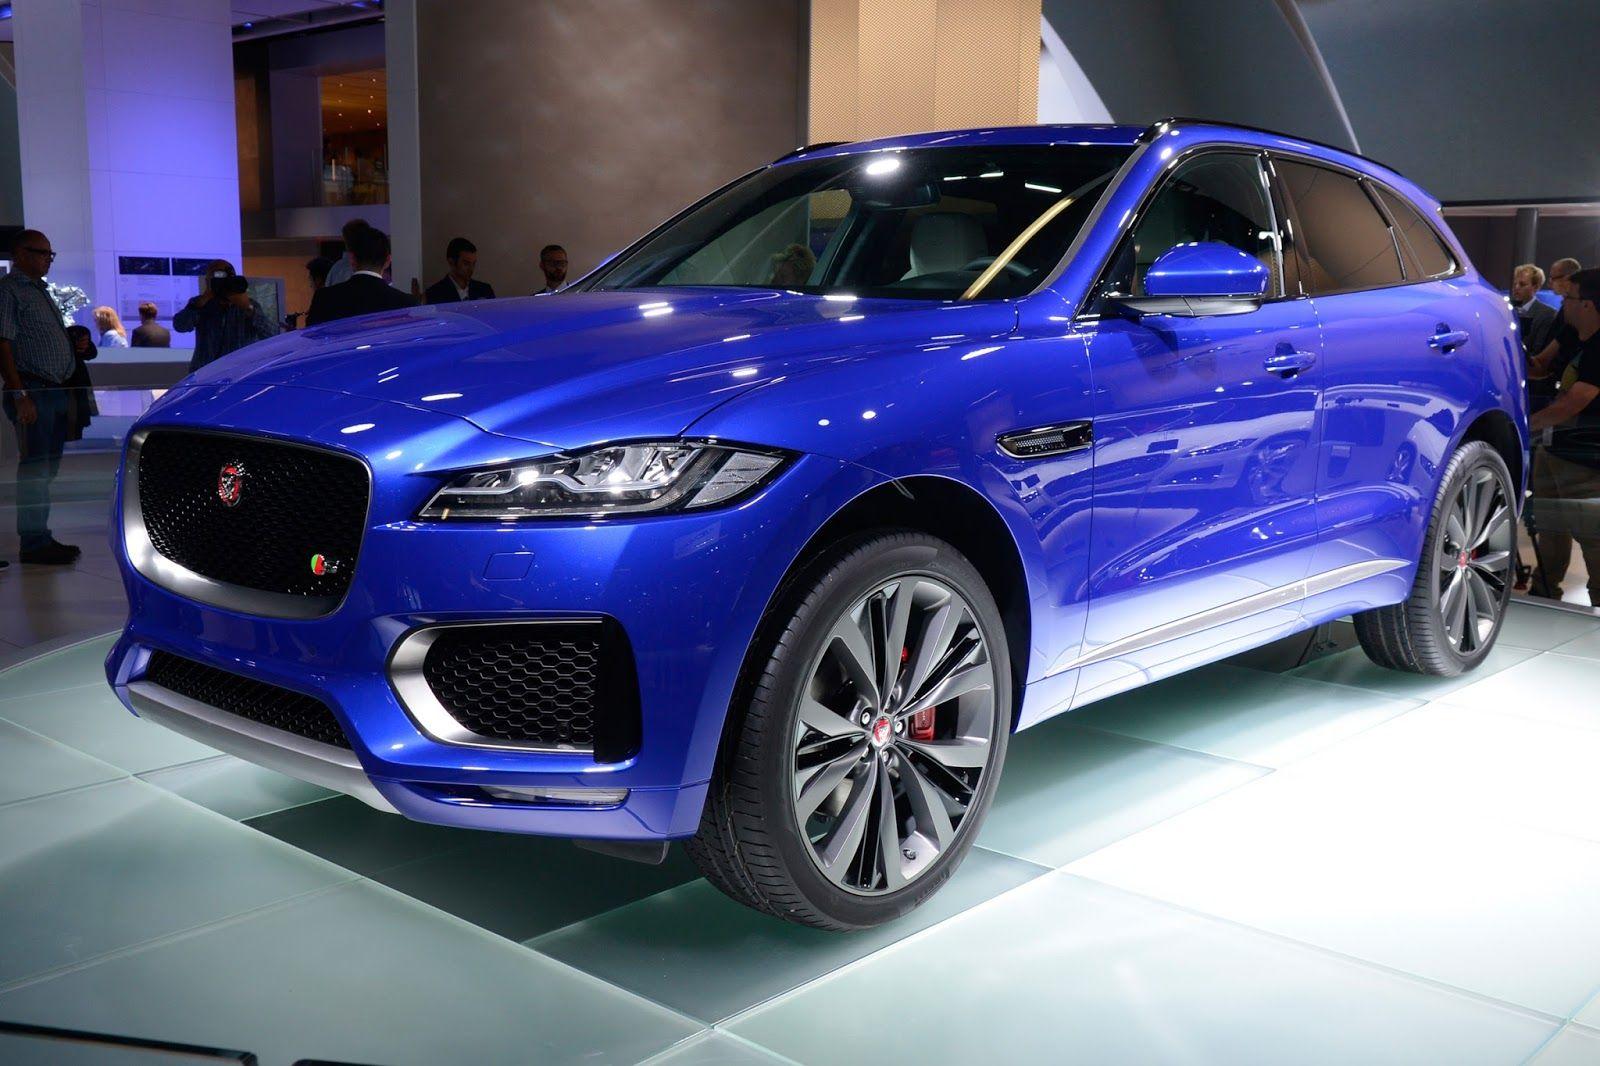 Indonesia will be launching SUV Jaguar (Dengan gambar) Suv